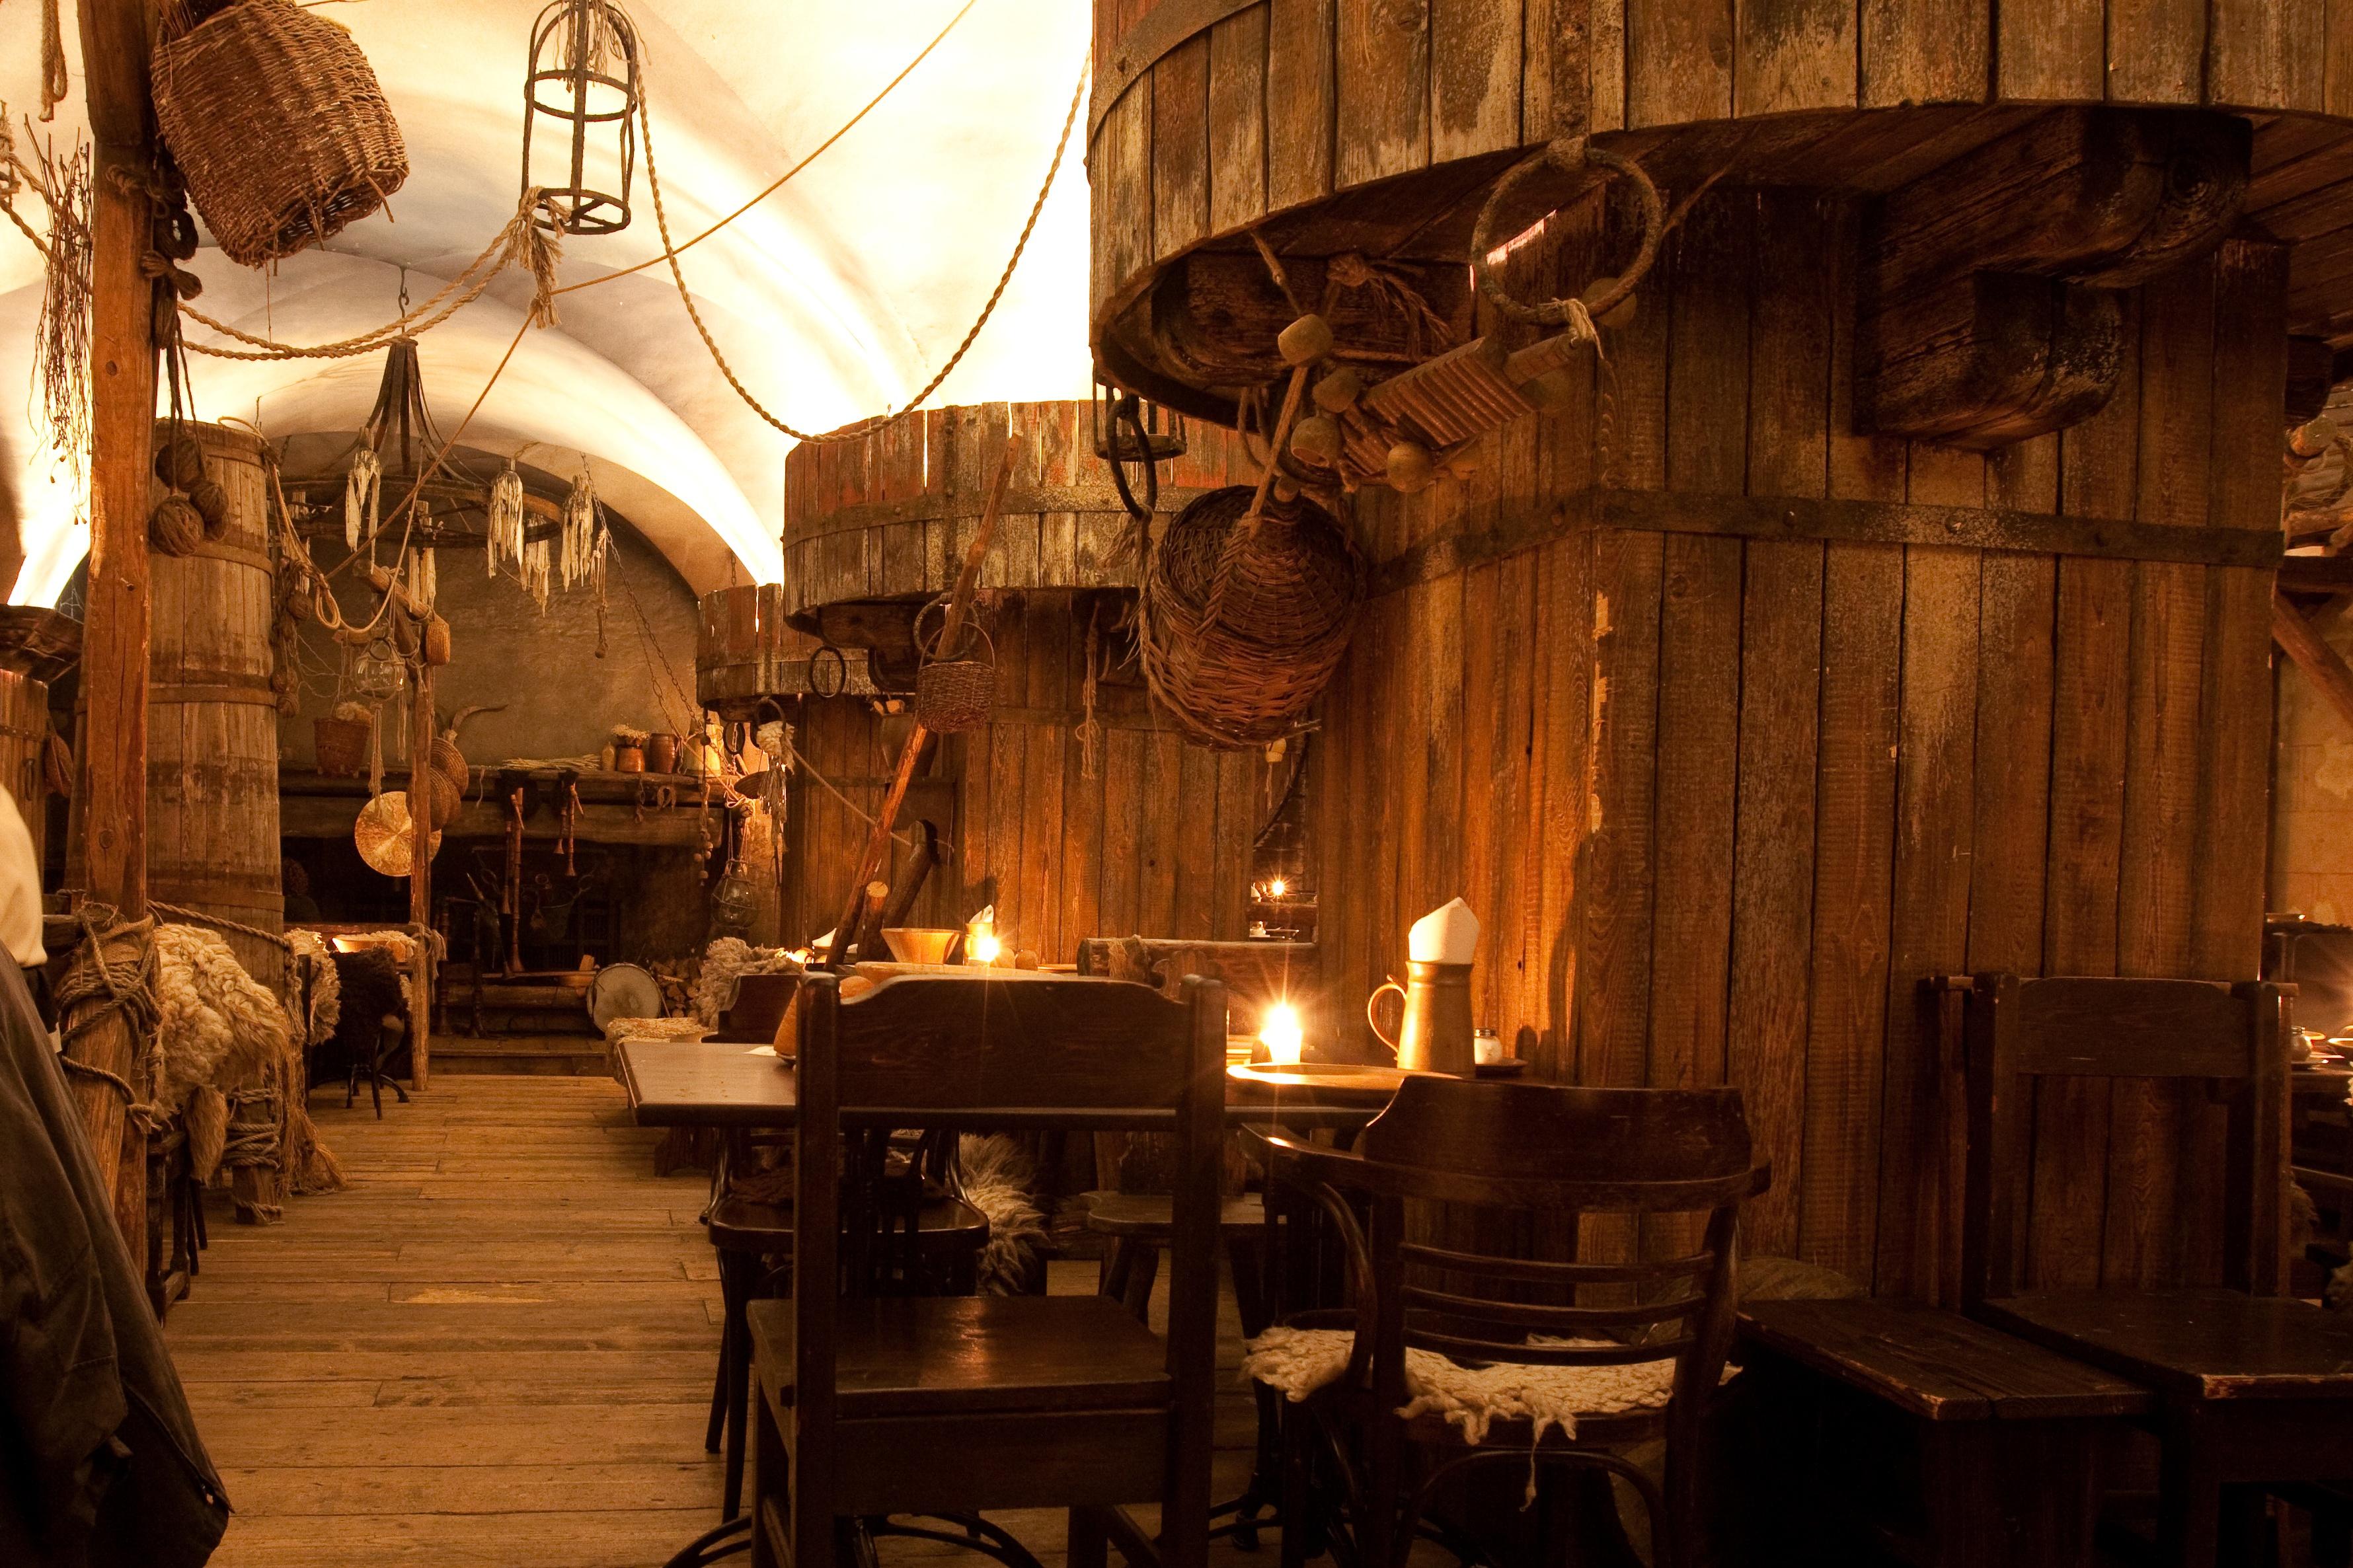 U Pavouka Medieval Tavern 2 Flickr Photo Sharing